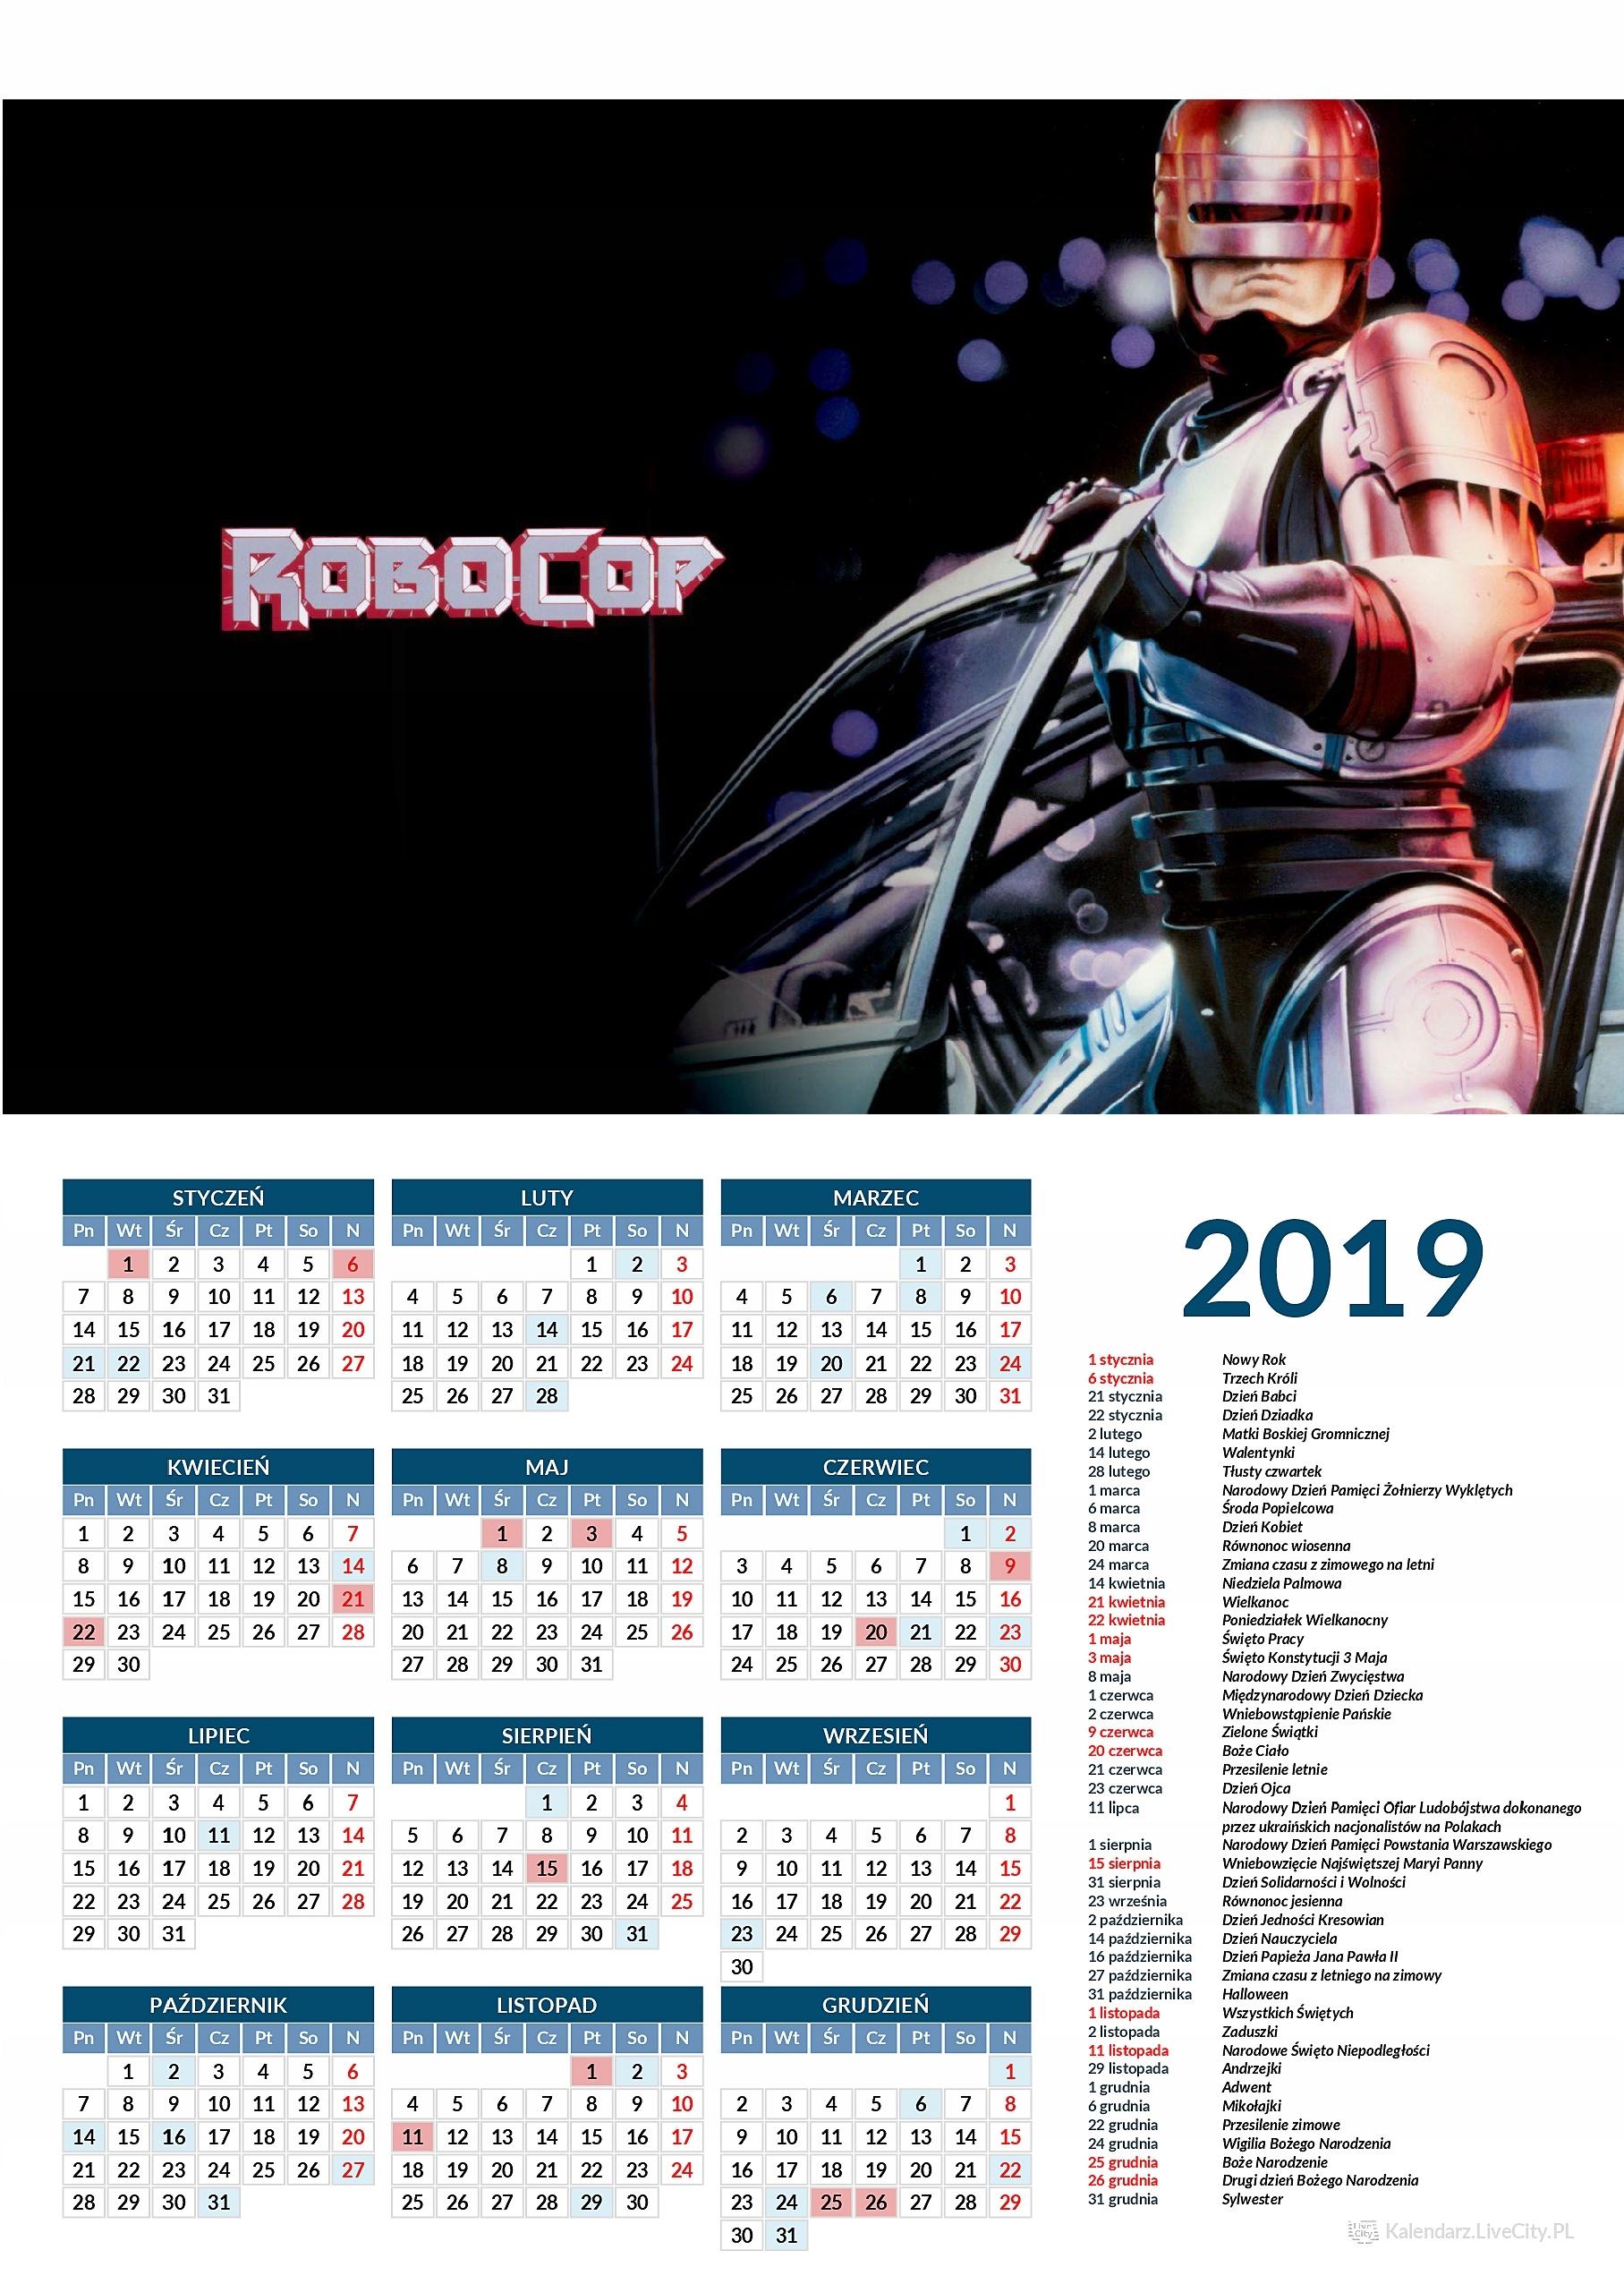 Kalendarz 2019 GRA ROBOCOP